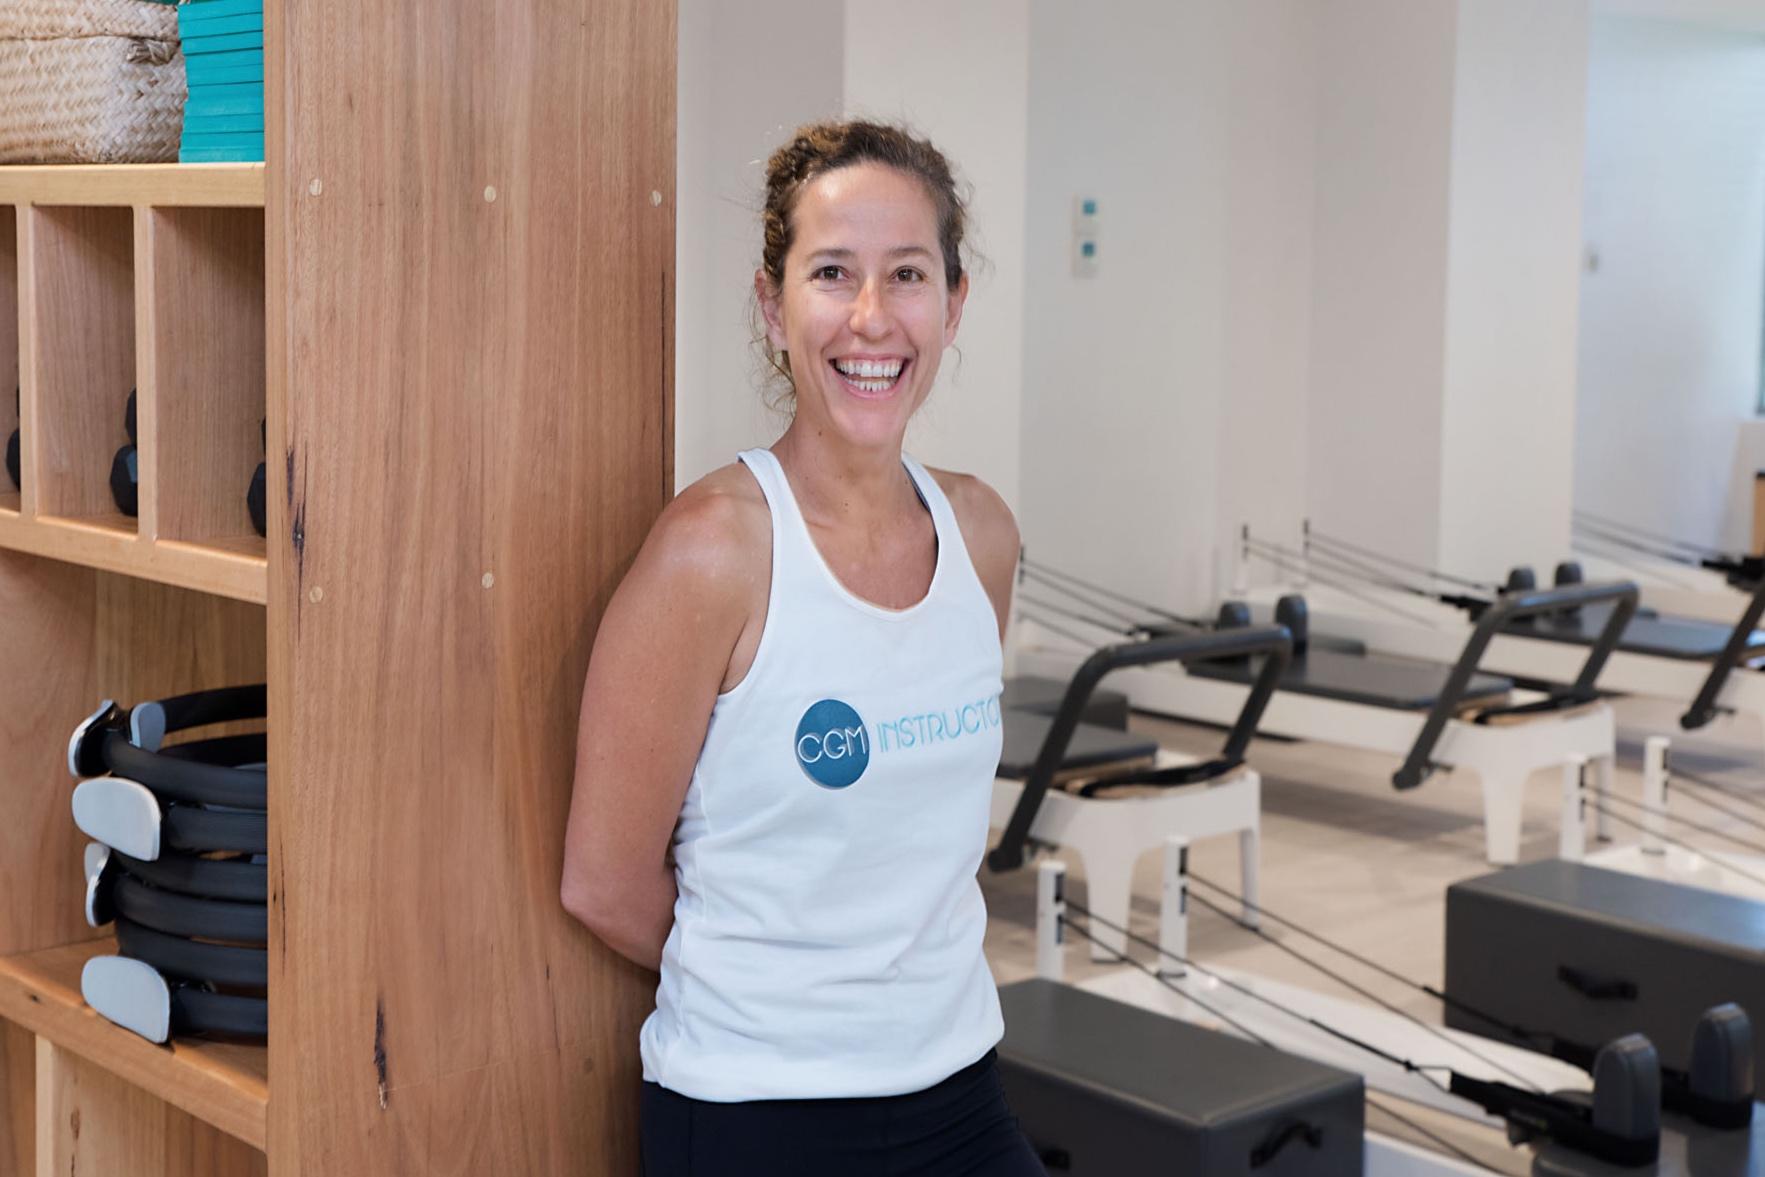 CGM Pilates Instructor